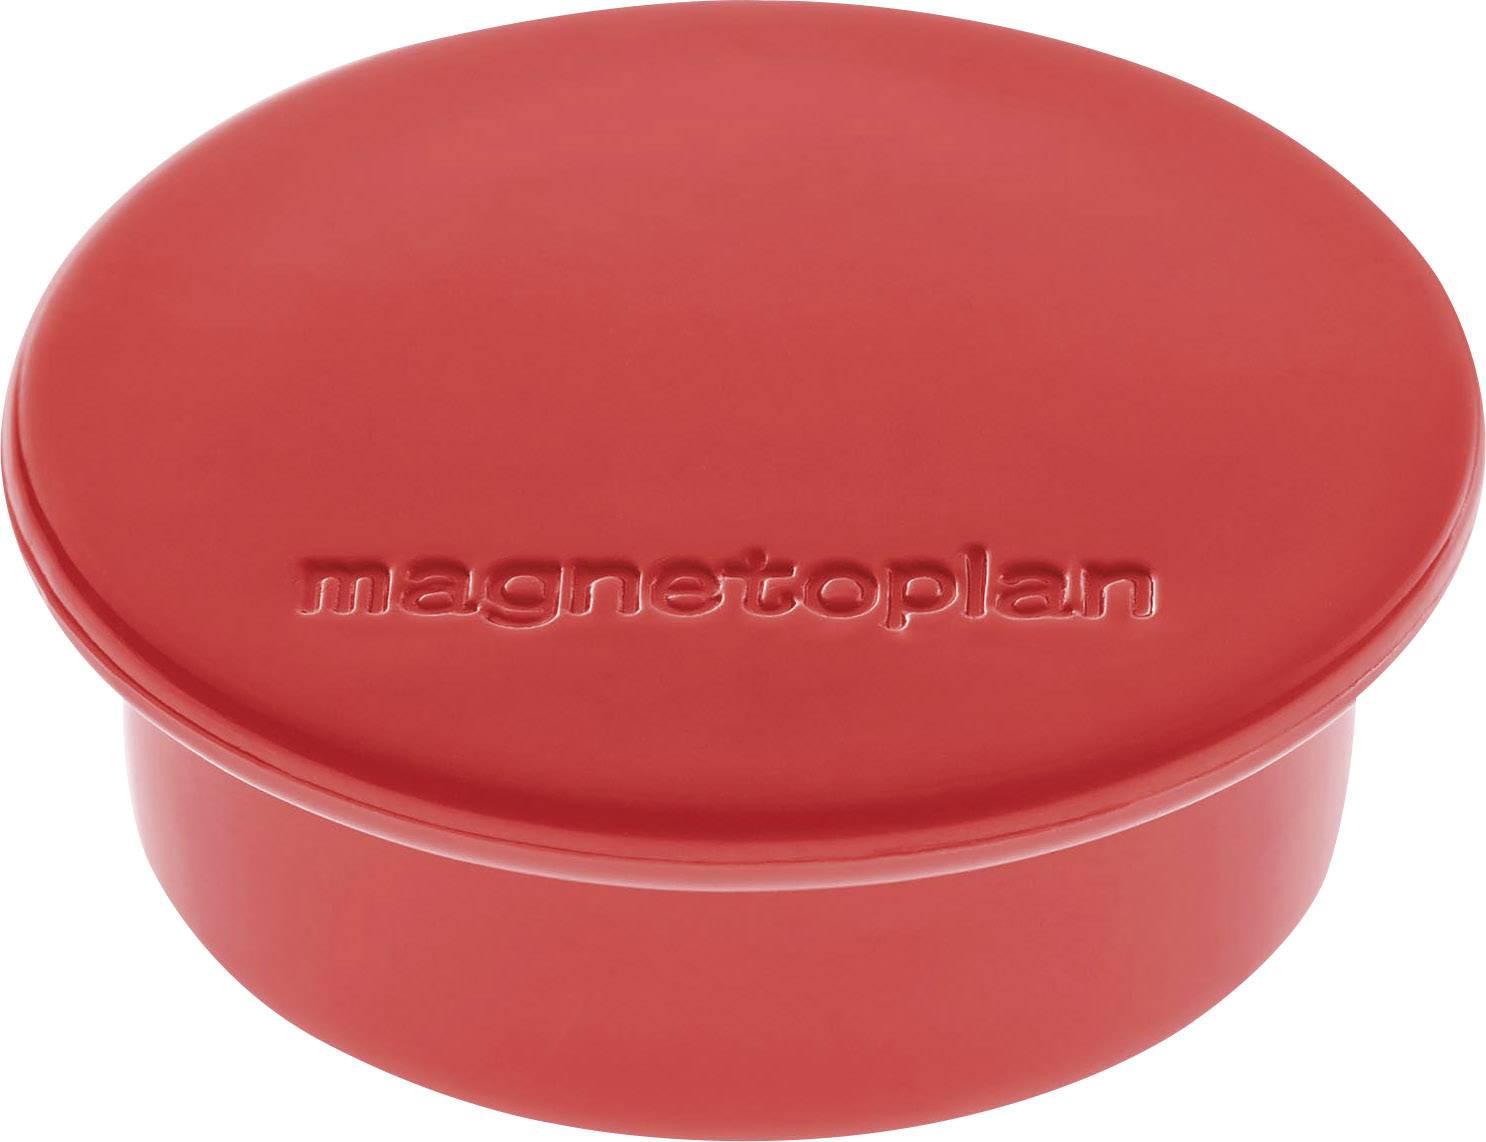 Magnetoplan Colour Magnet Holder 40 mm 10 Items White